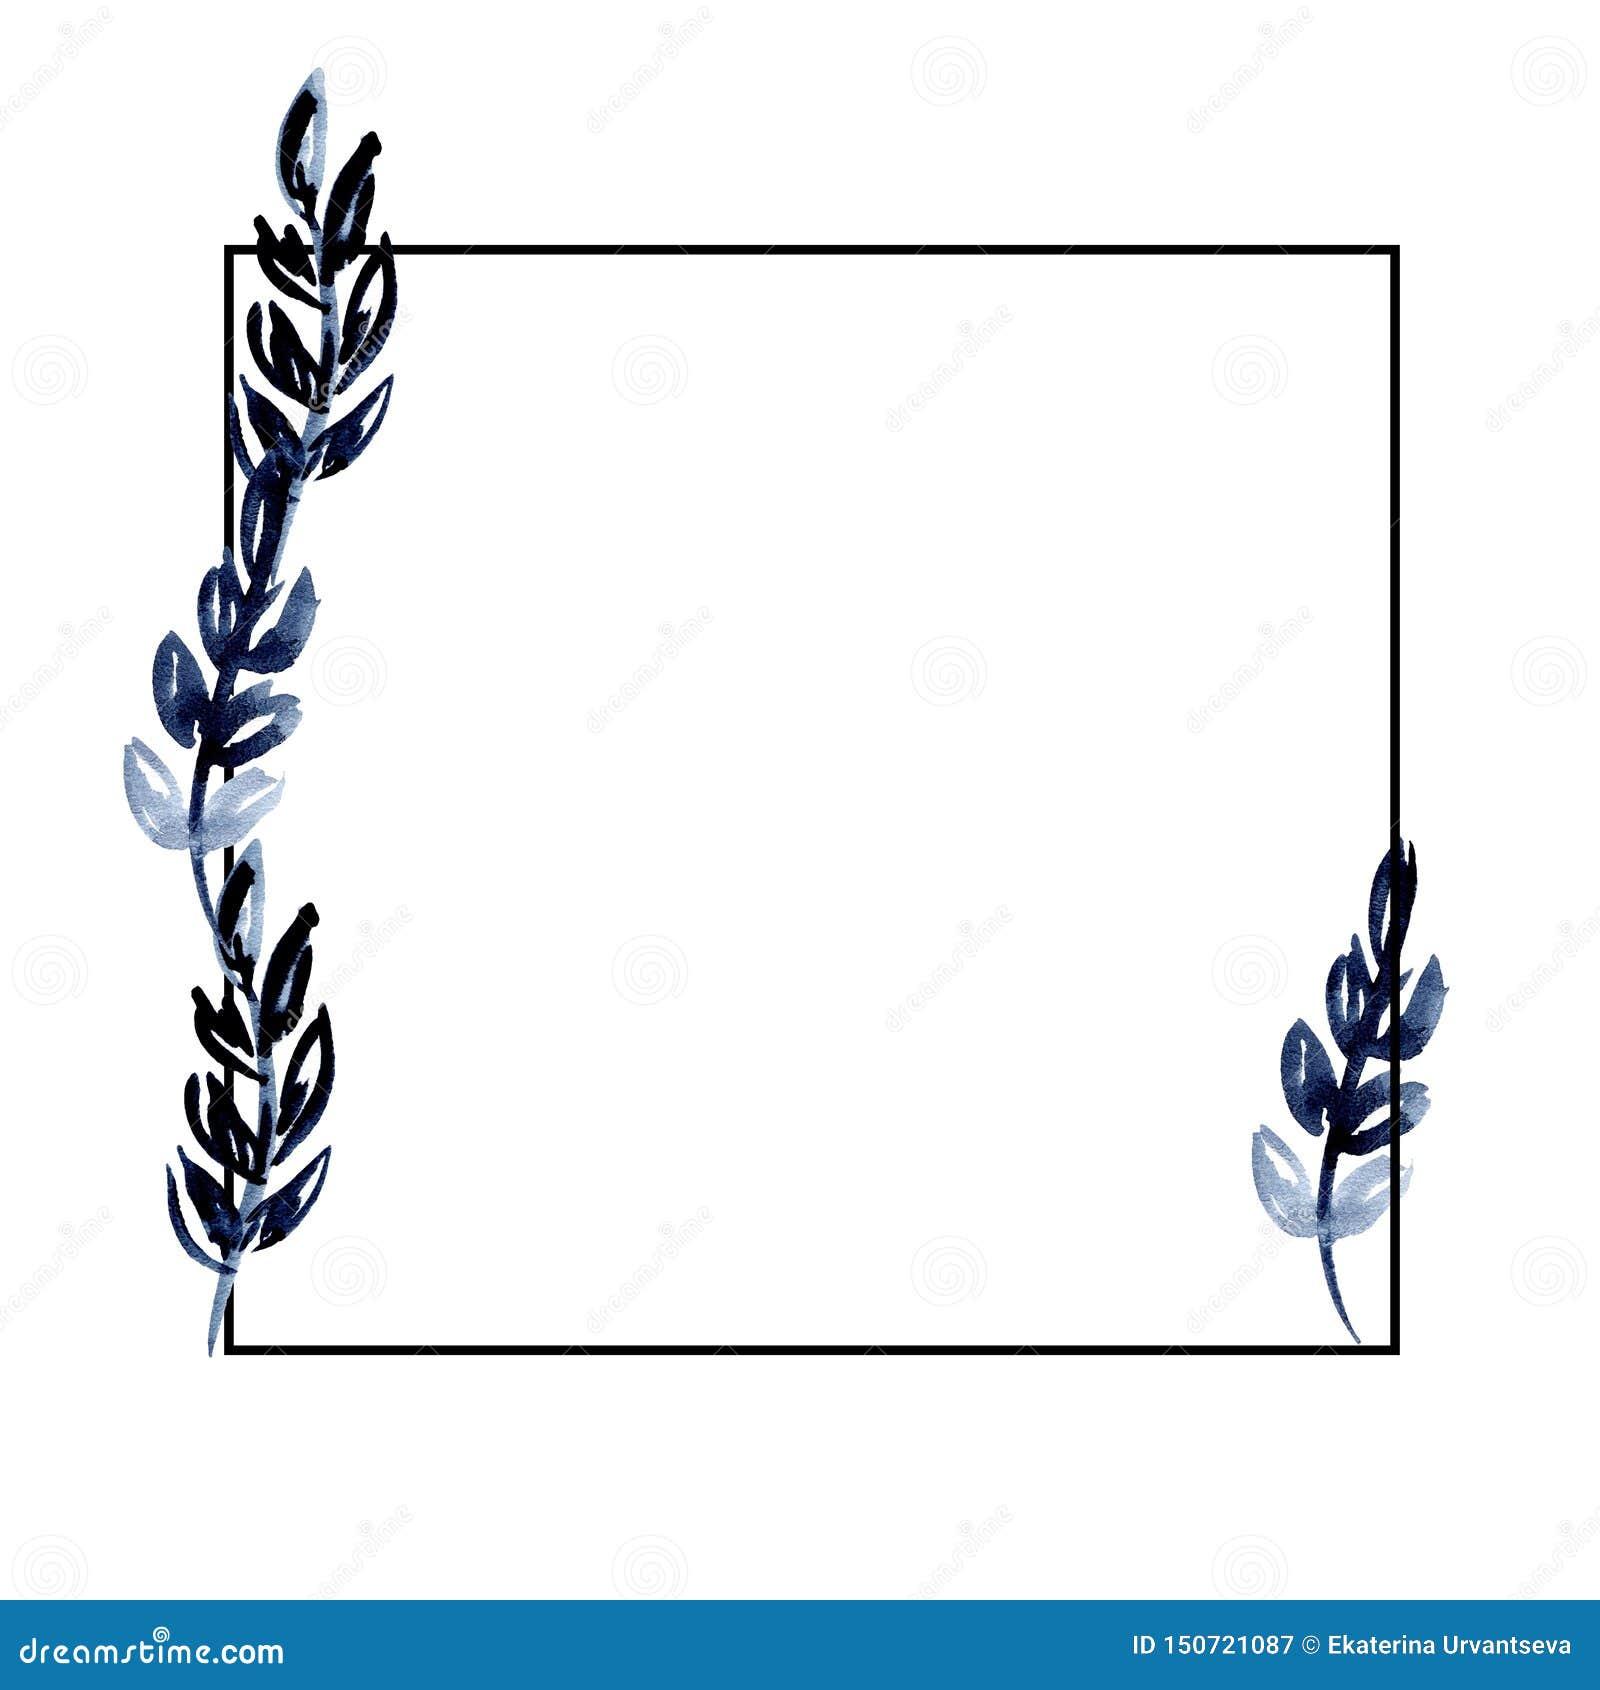 Watercolor illustration black square frame with indigo leaves. for design, invitation wedding, greeting cards